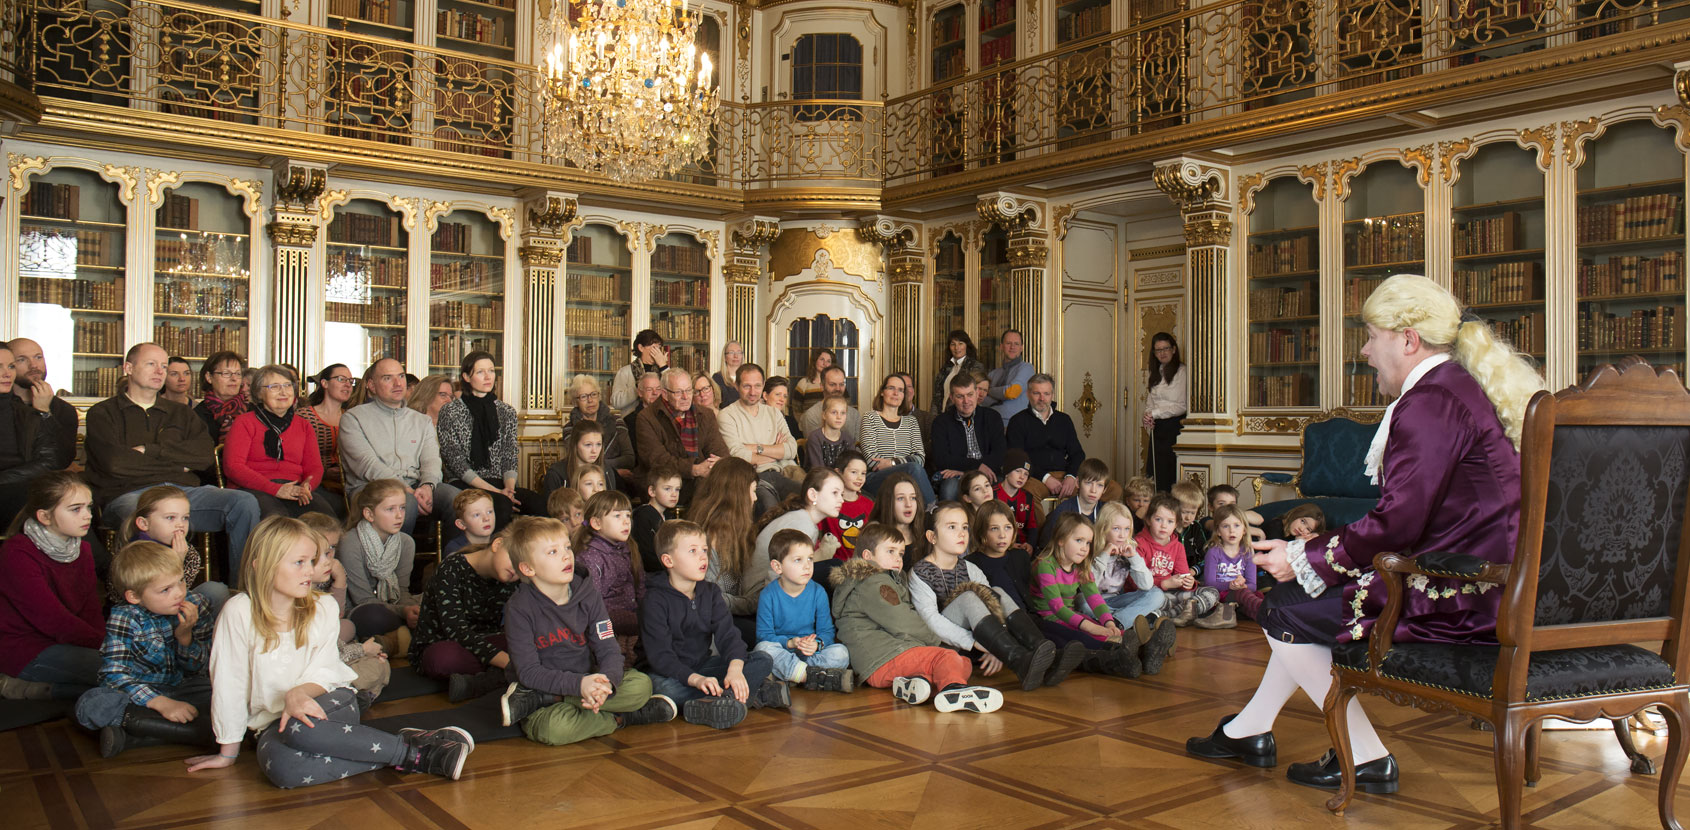 Christian 7. i Dronningens Håndbibliotek foto Thorkild jensen